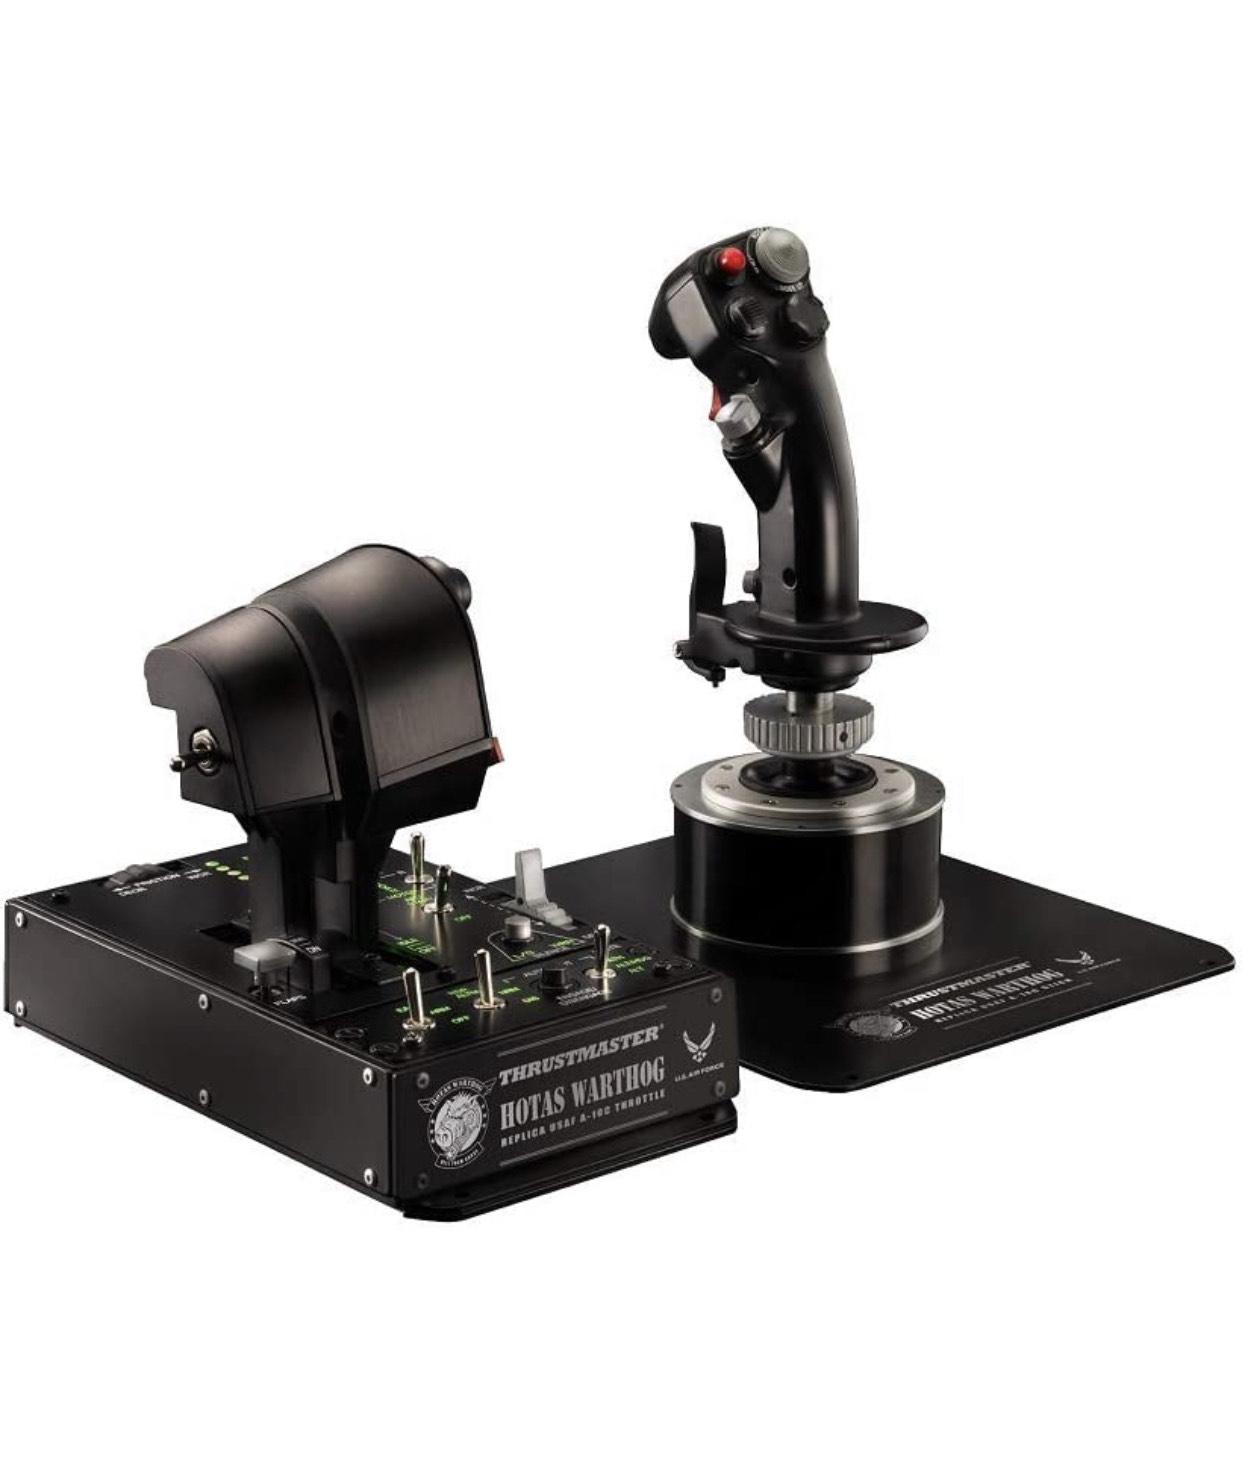 Thrustmaster HOTAS Warthog Joystick £281 at Amazon